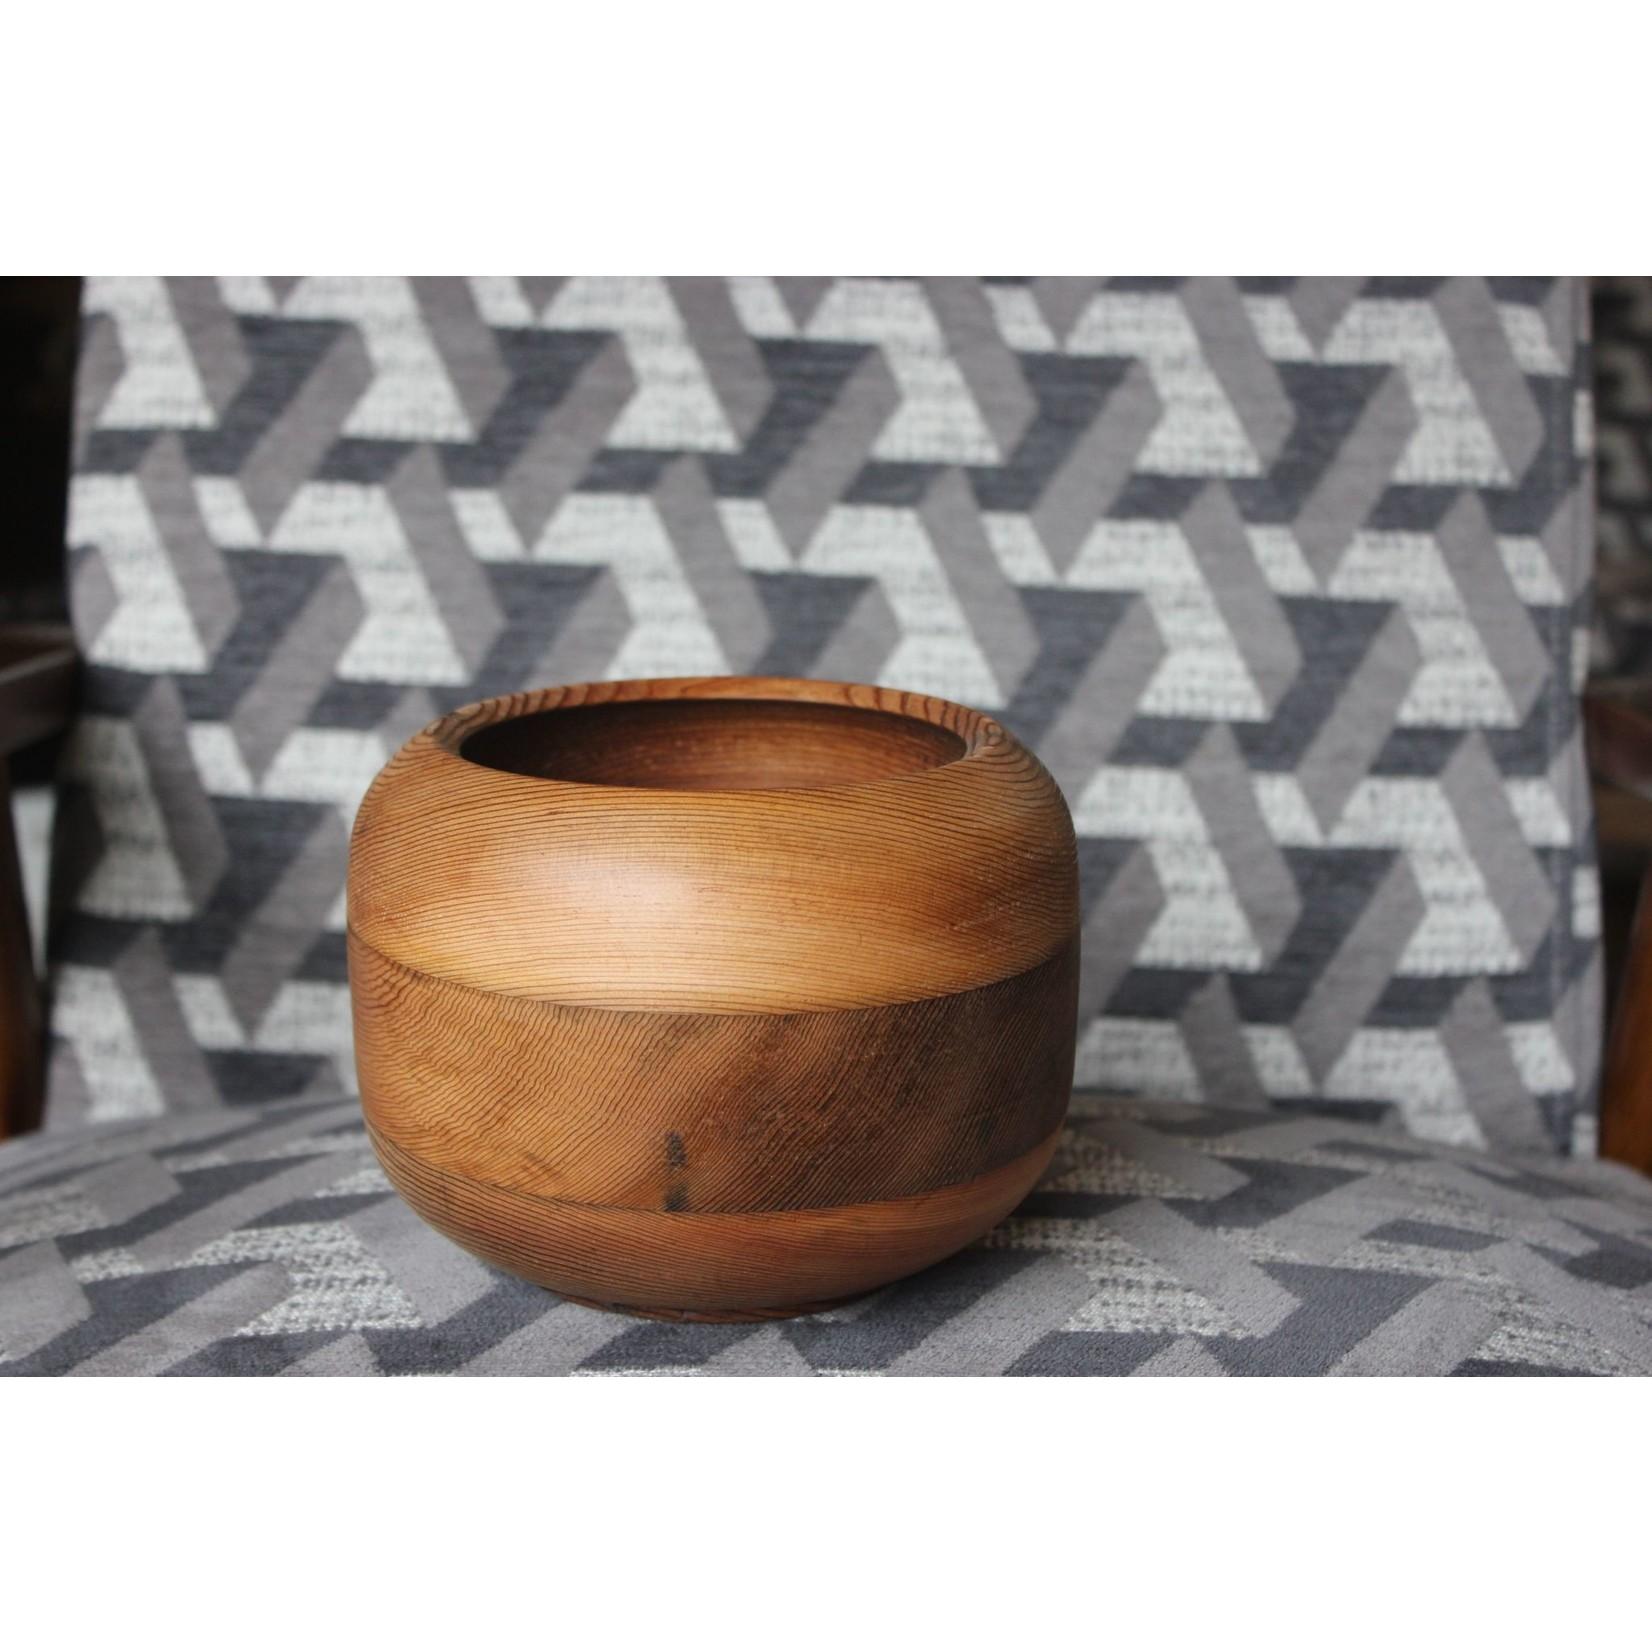 Specifically Pacific Designs bowl reclaimed cedar #4